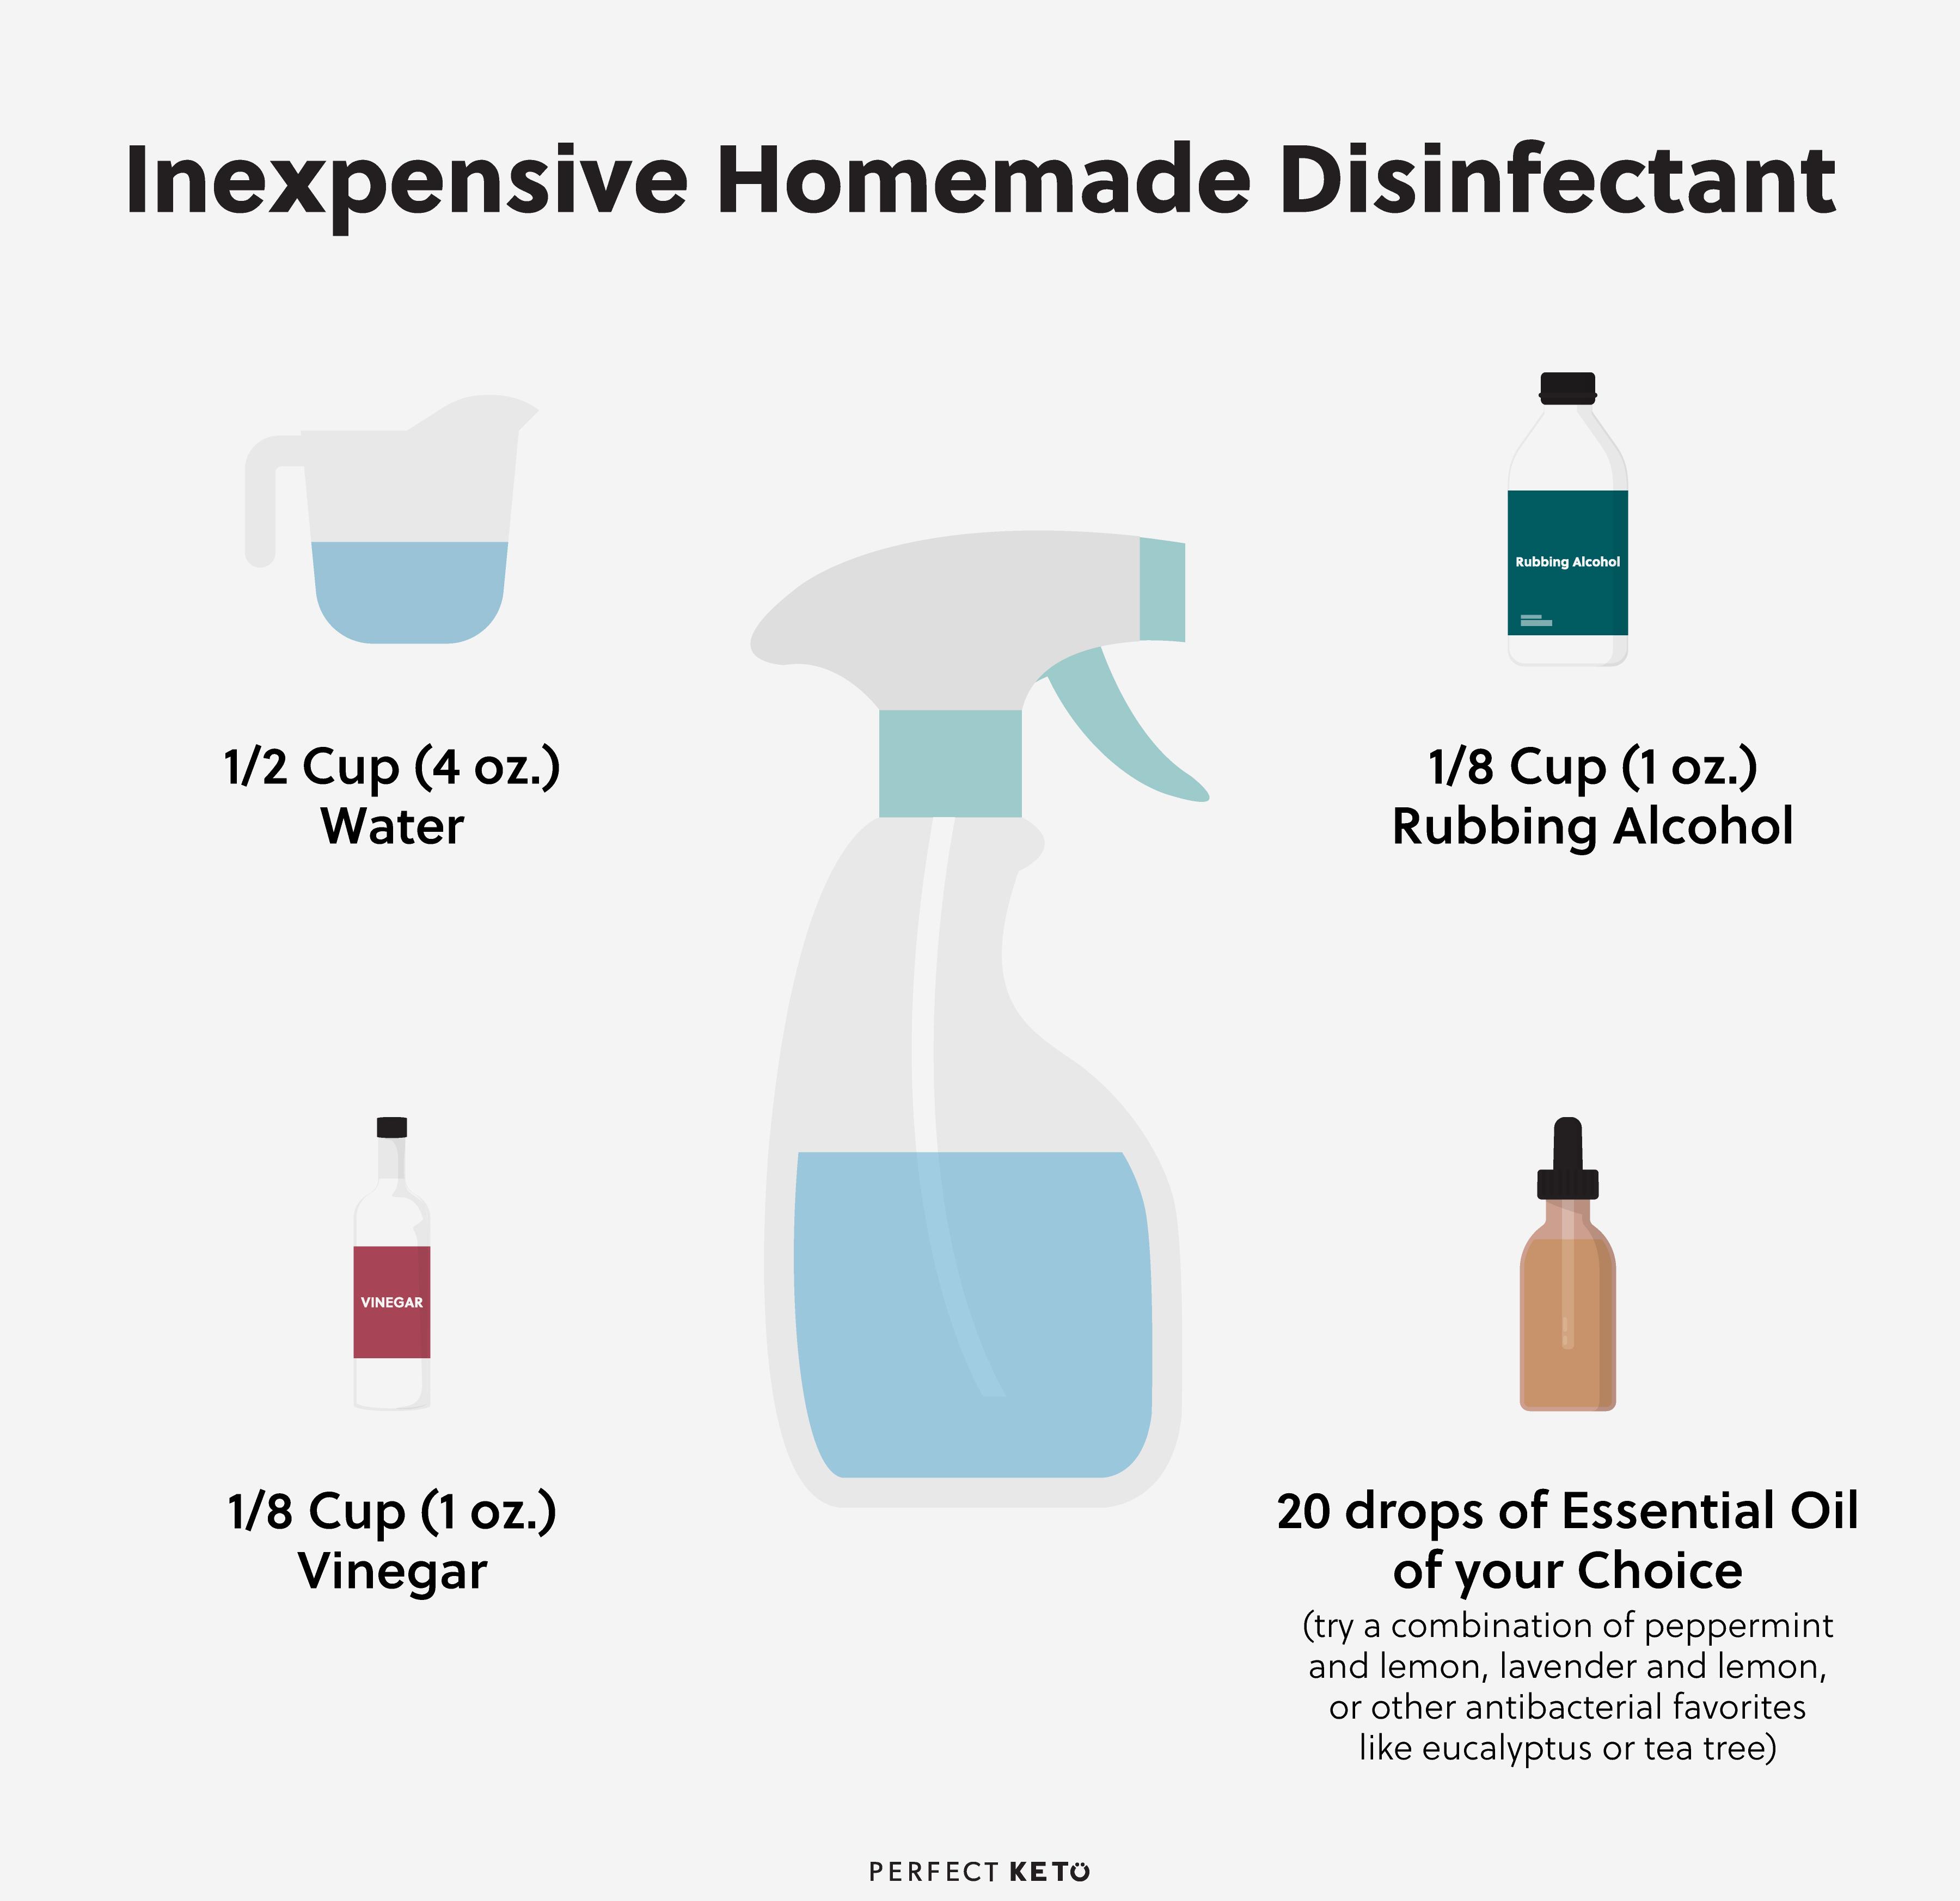 inexpensive-homemade-disinfectant.jpg